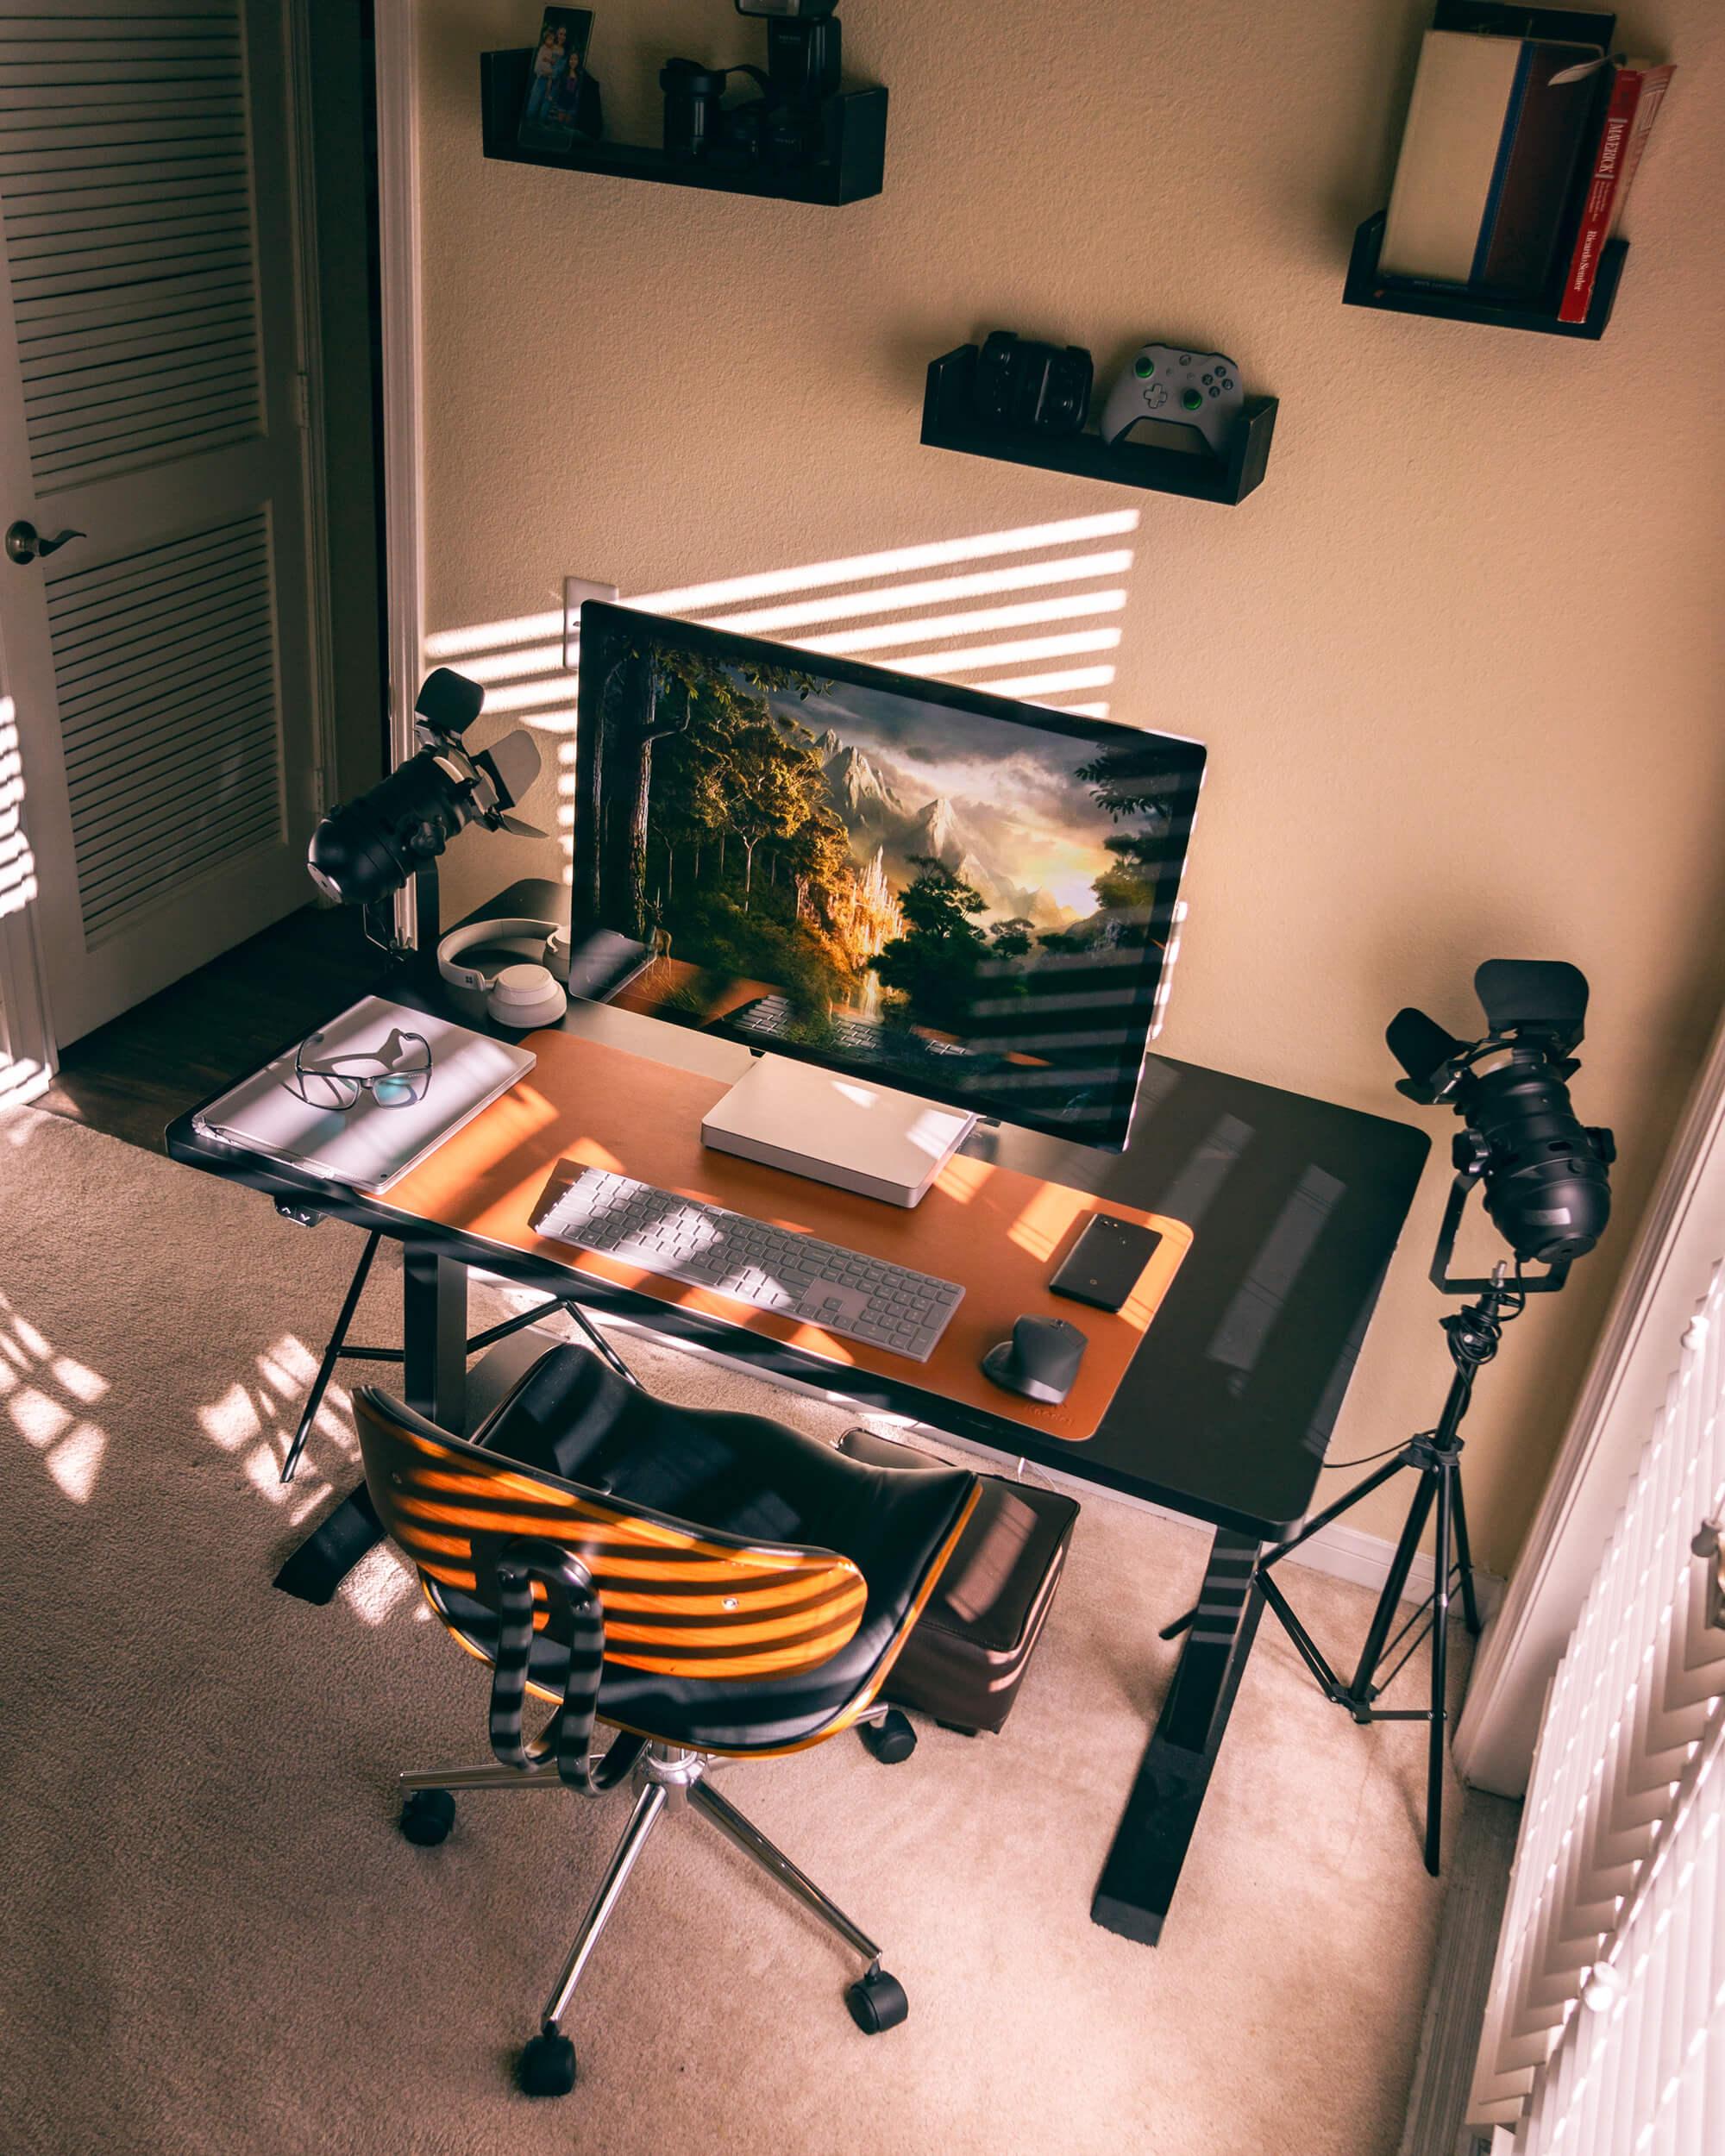 Freelance graphic design setup featuring Microsoft Surface Studio 2